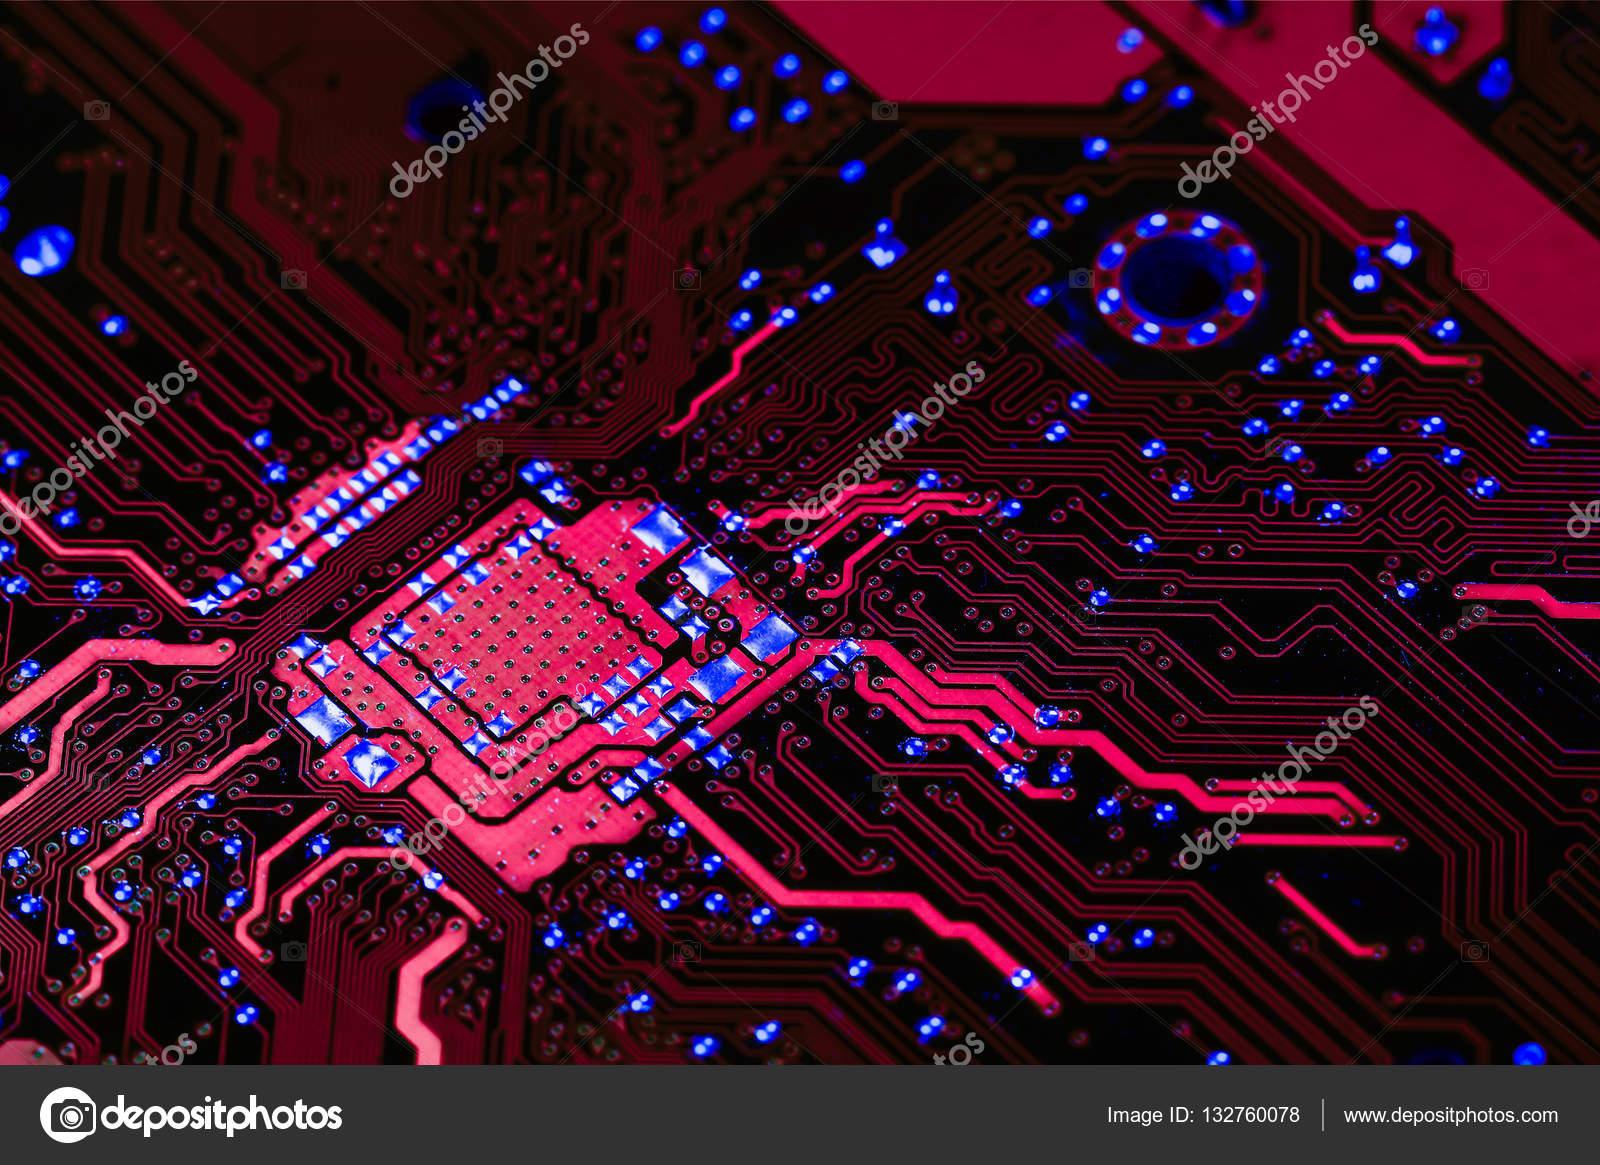 Circuito Eletronico : Placa de circuito eletrônico u stock photo tcareob